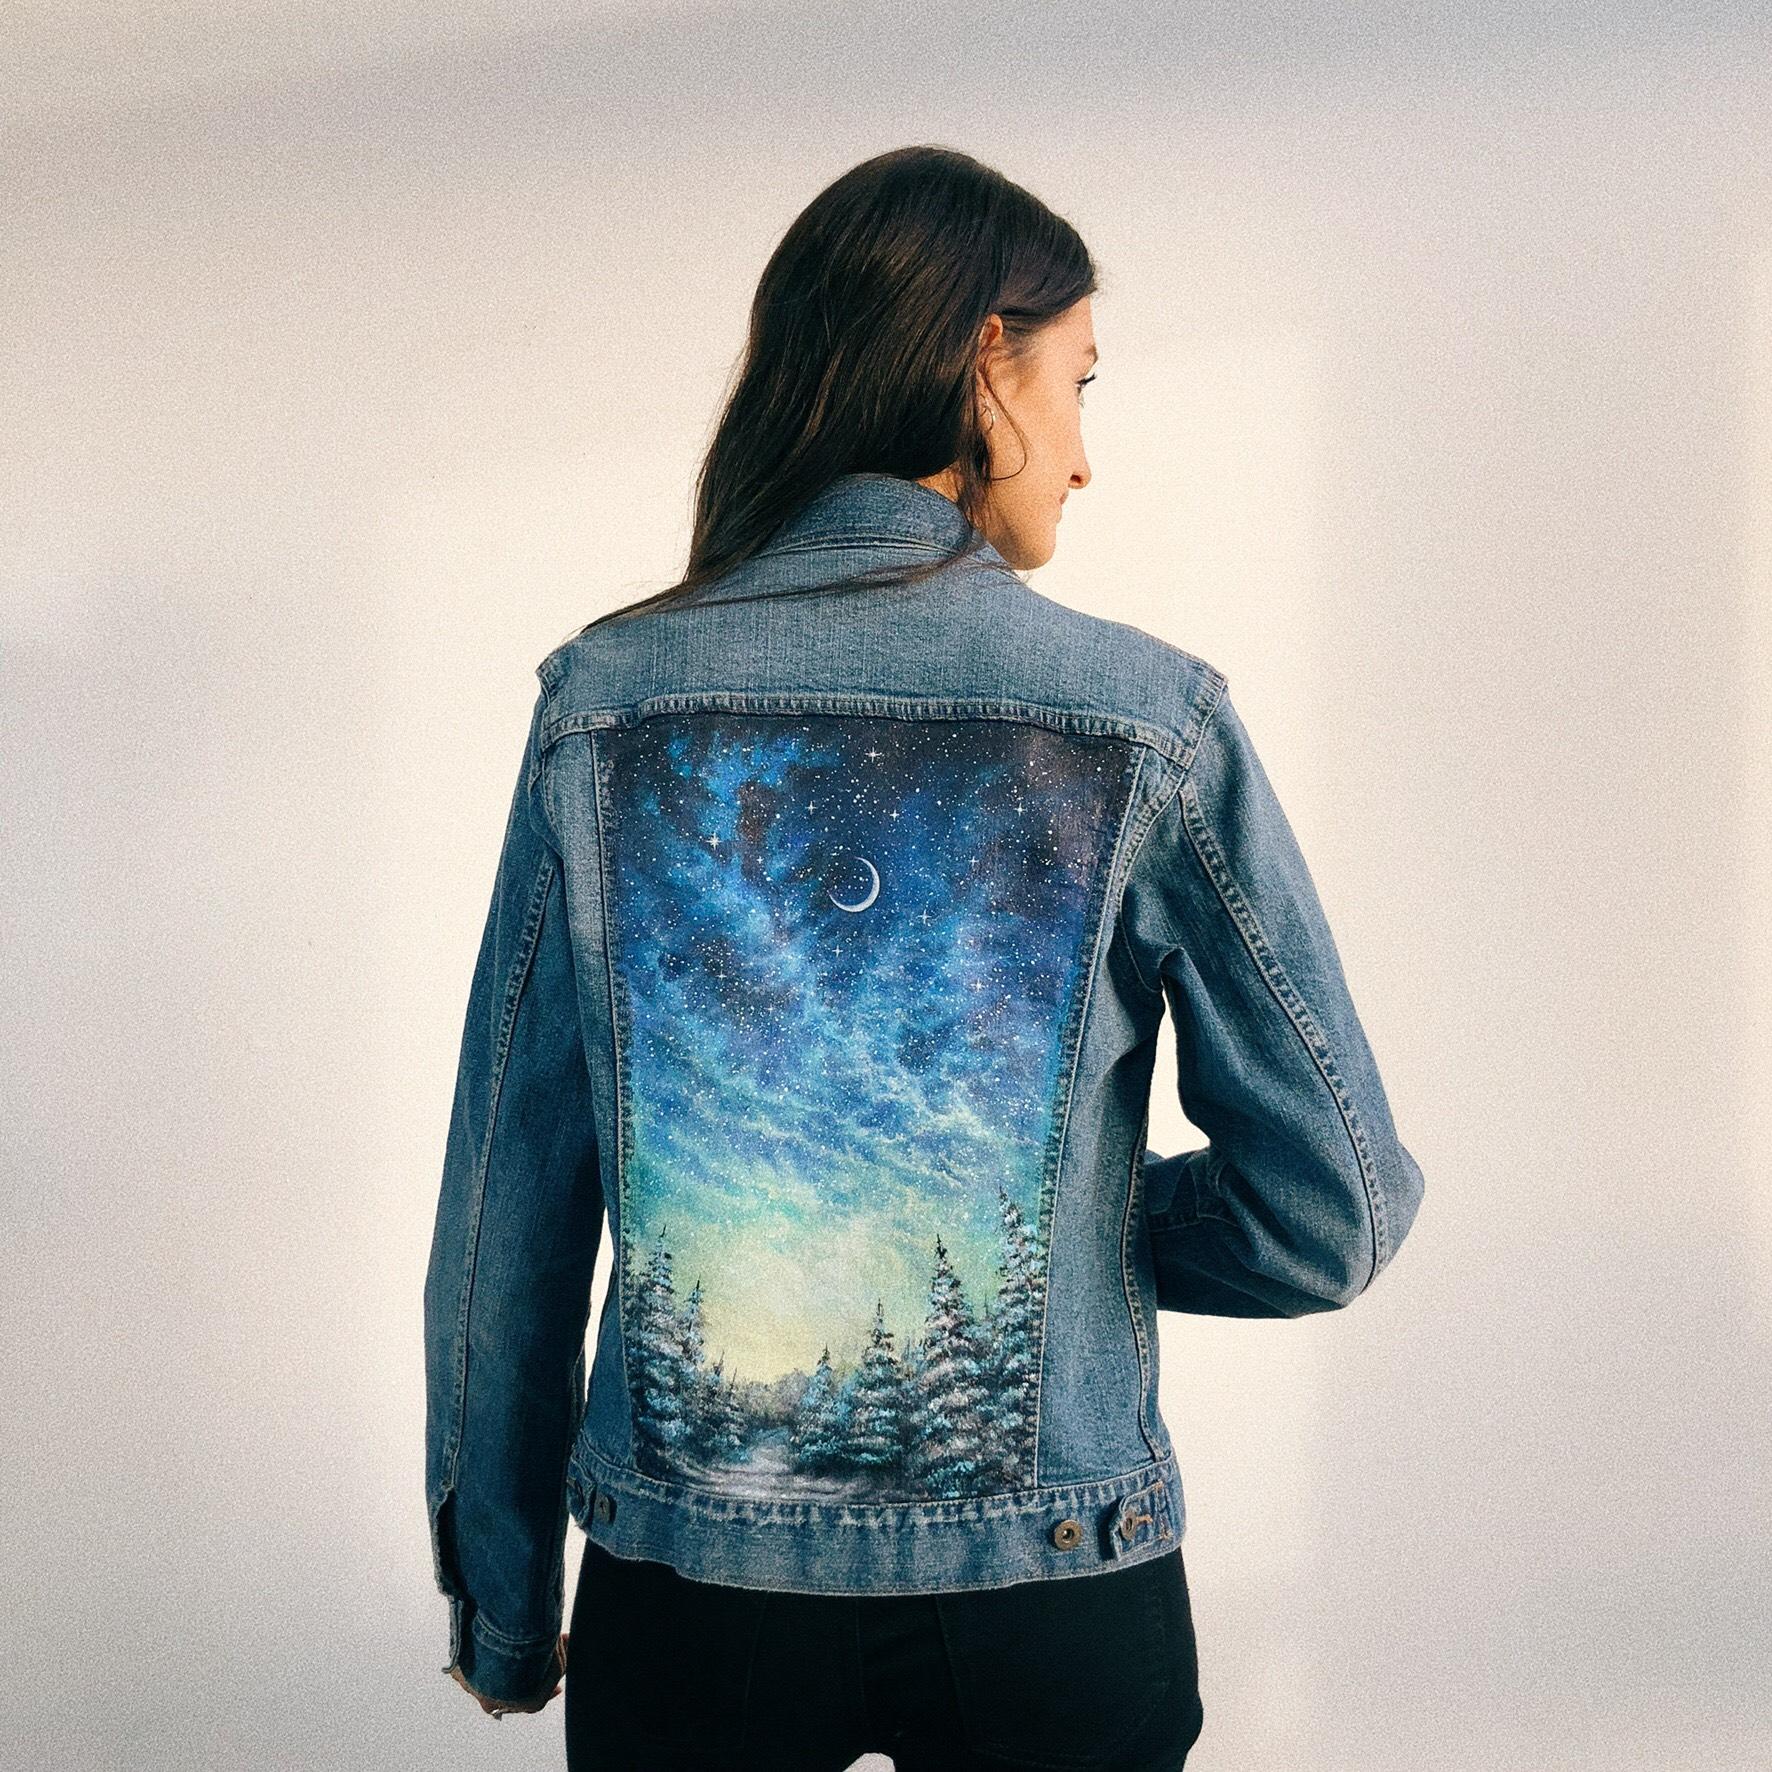 Amazing Art to Wear – Fubiz Media Design